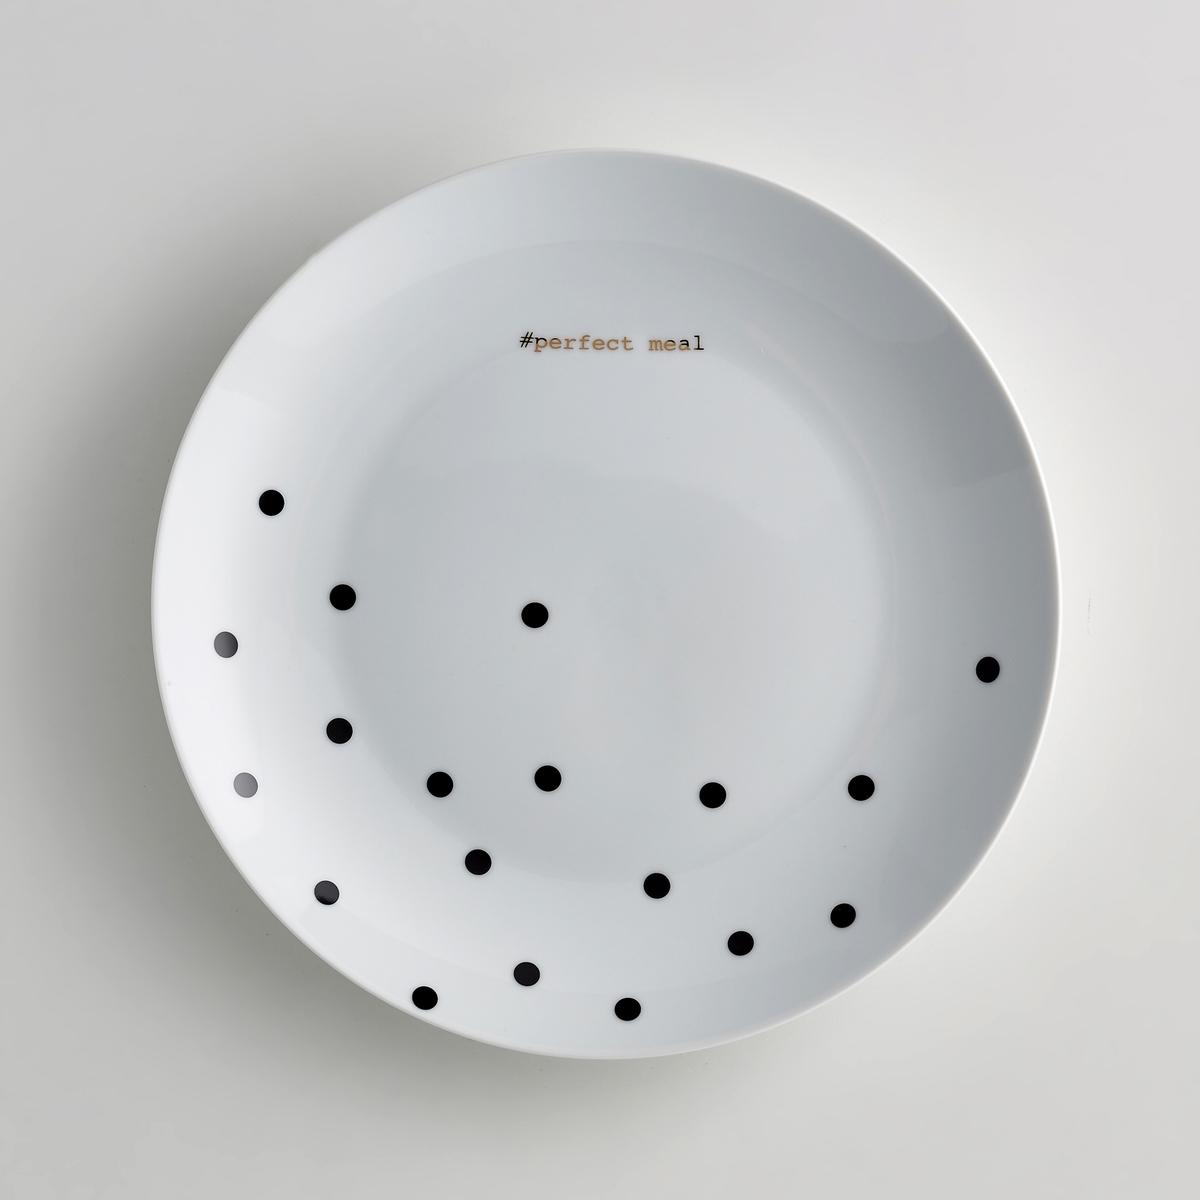 Комплект из 4 мелких тарелок из фарфора, KUBLER комплект из 4 колец для салфеток kubler